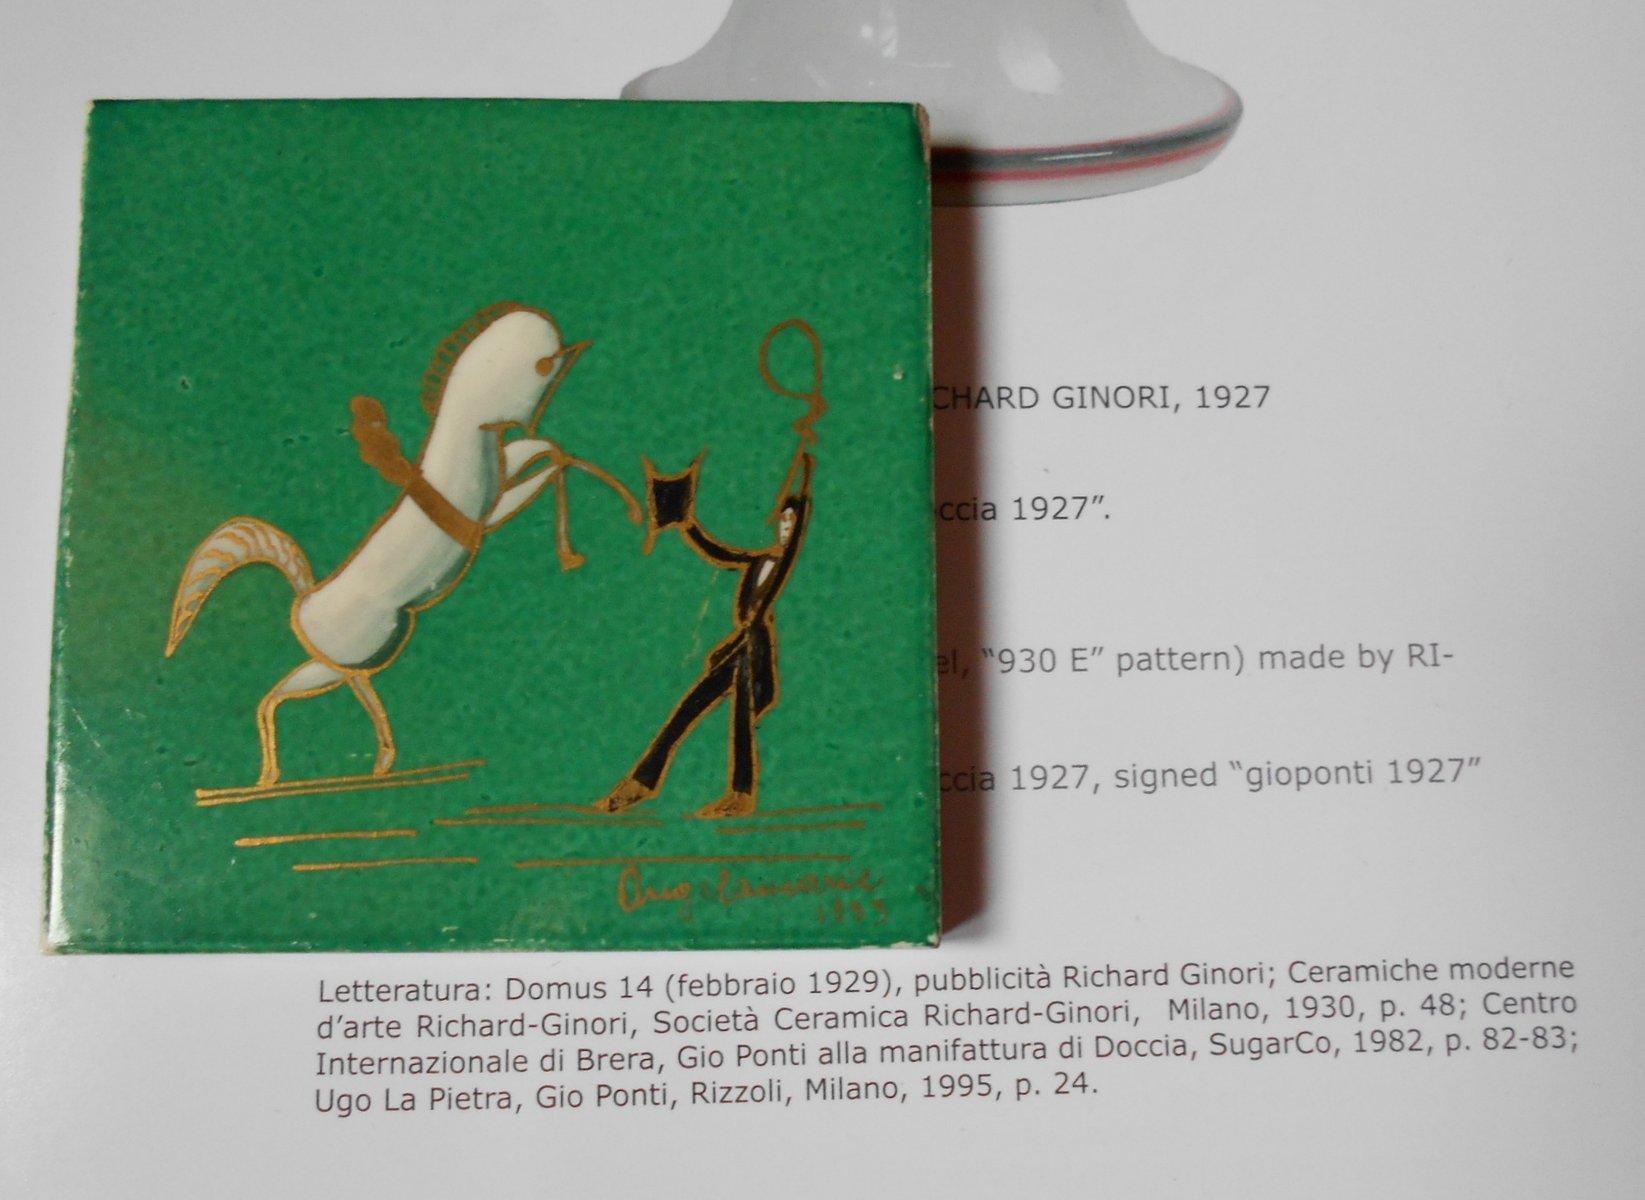 Art deco ceramic tile by gio ponti for richard ginori 1933 for price 72100 regular price 77300 dailygadgetfo Gallery